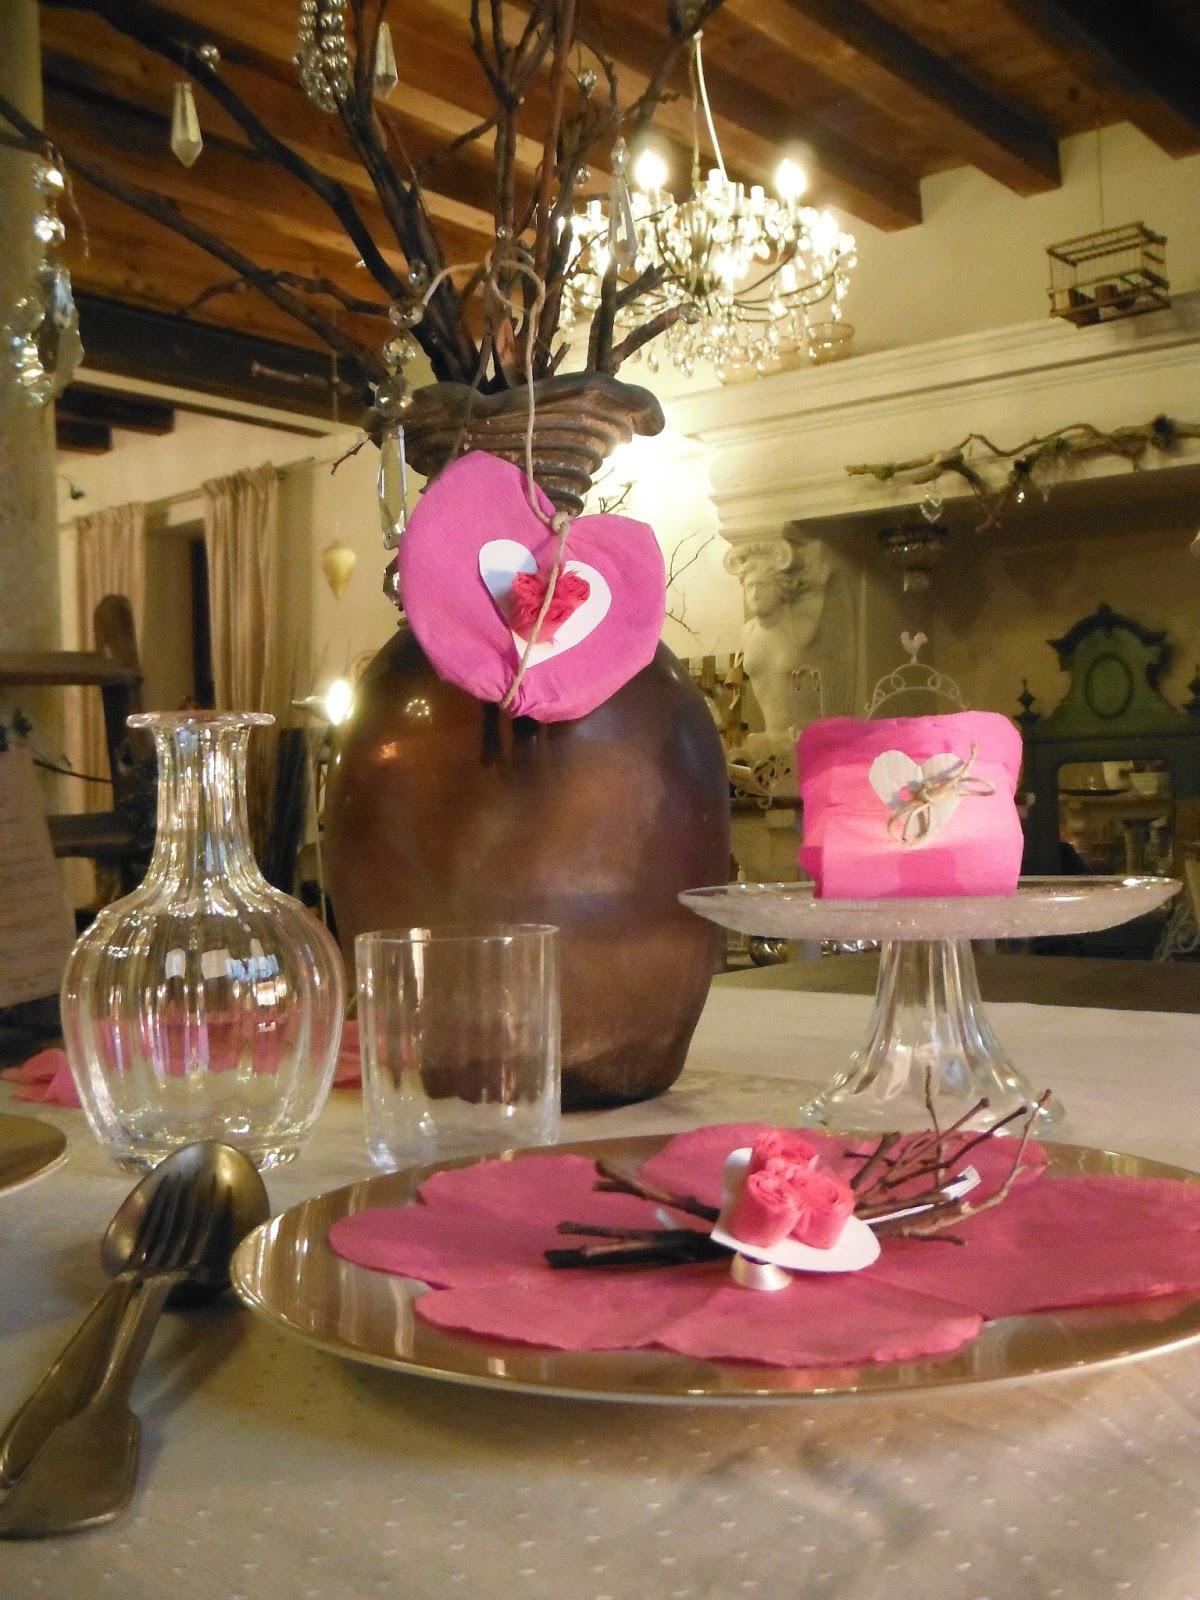 La tavola di san valentino prepariamola insieme con - Tavola di san valentino ...